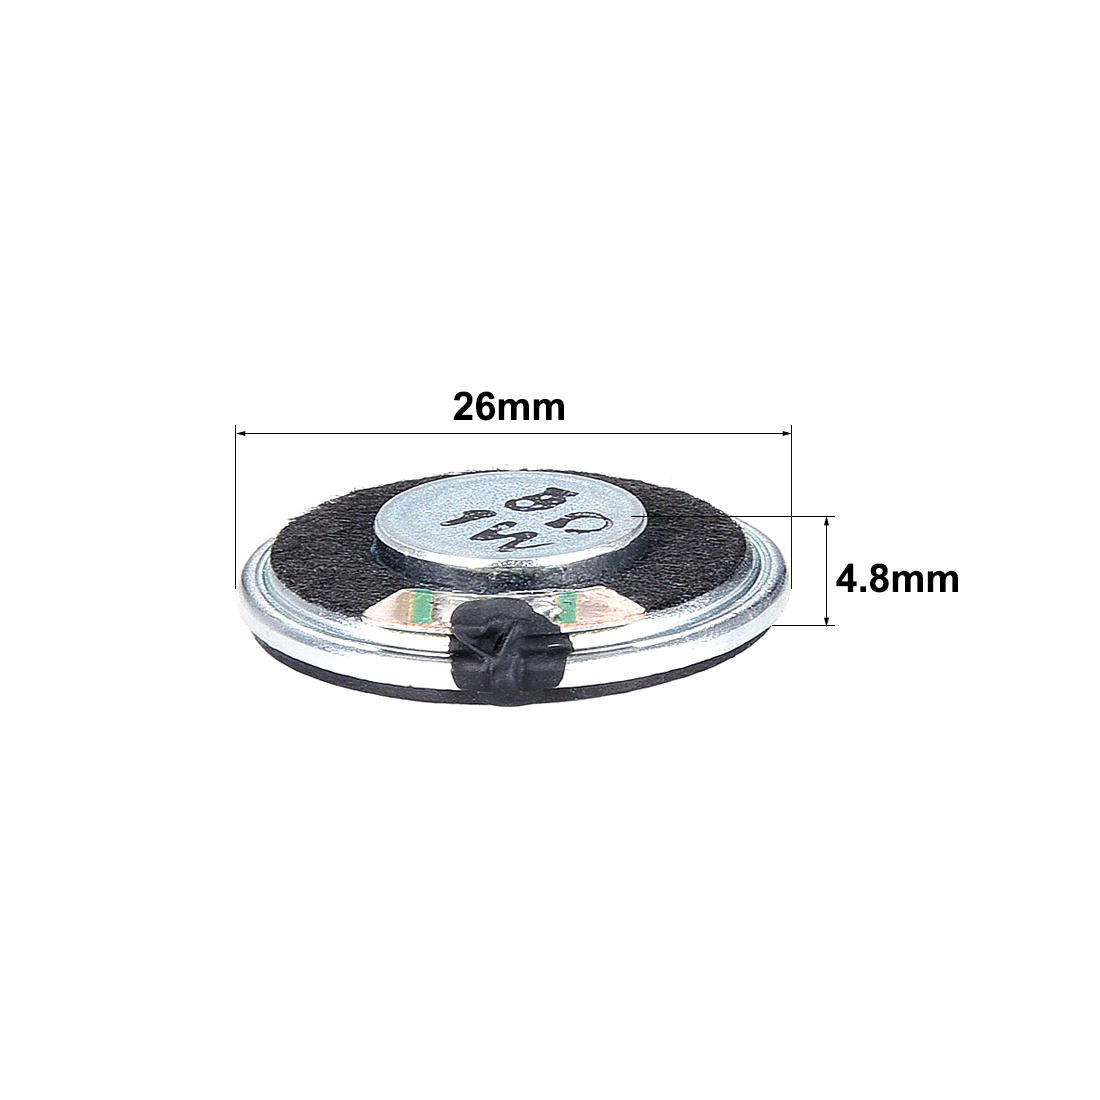 1W 8 Ohm Speaker 26mm Round Shape Loudspeaker for DIY Audio Speakers 4pcs - image 1 de 3